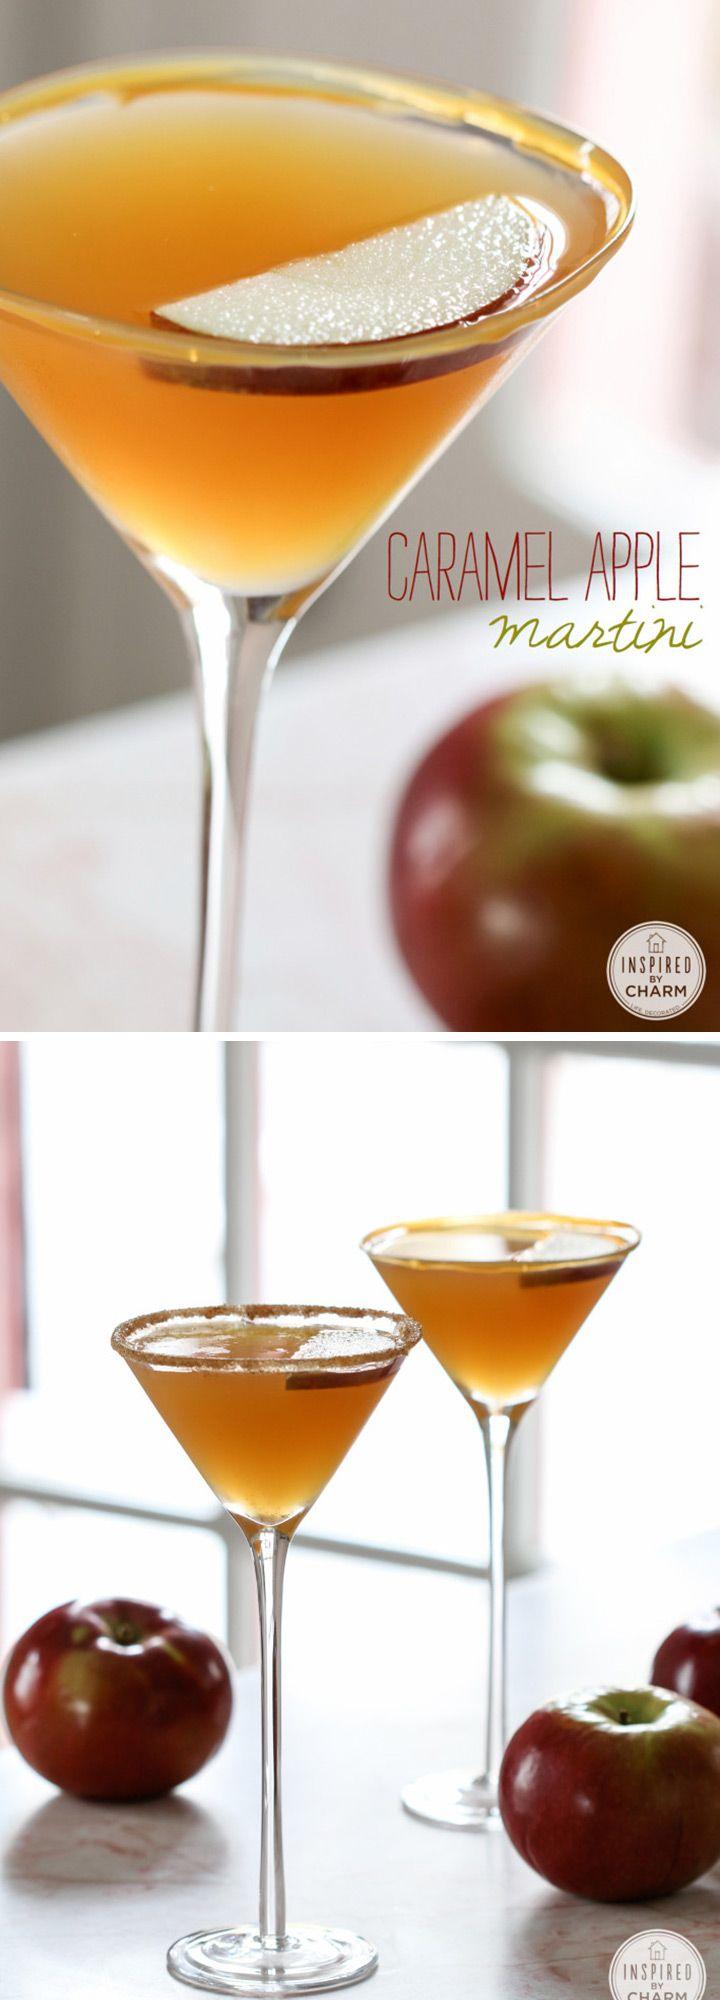 Caramel Apple Martini - Fall Wedding Signature Drink